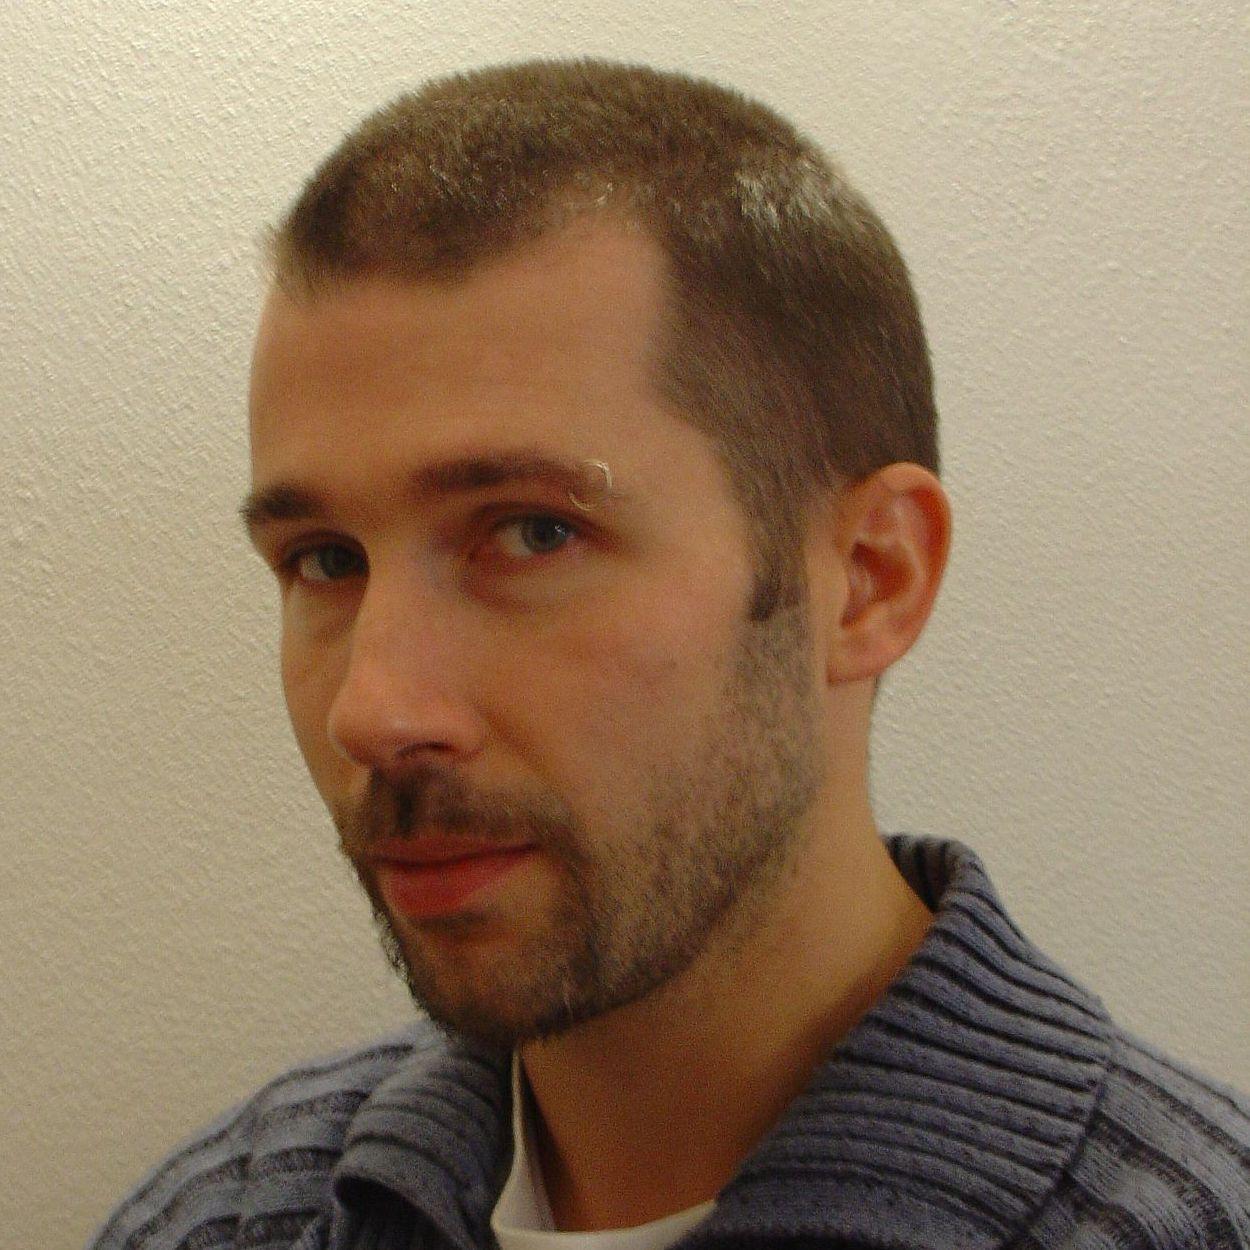 Matteo Tonezzer